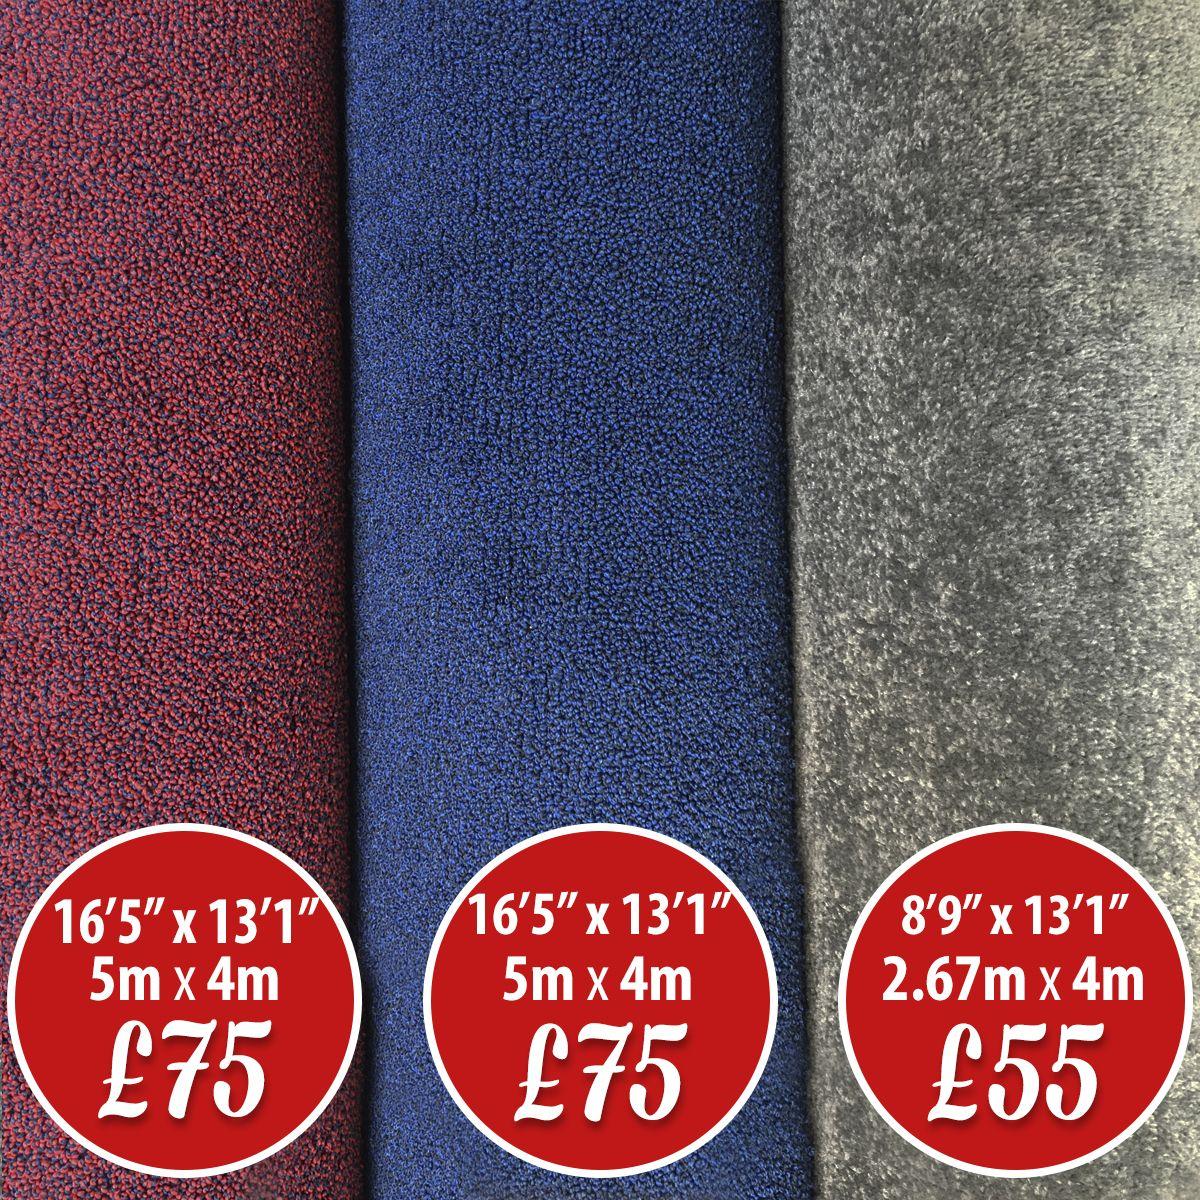 CARPET ROLL ENDS SALE 😊 Red Carpet with Blue Fleck 5m x